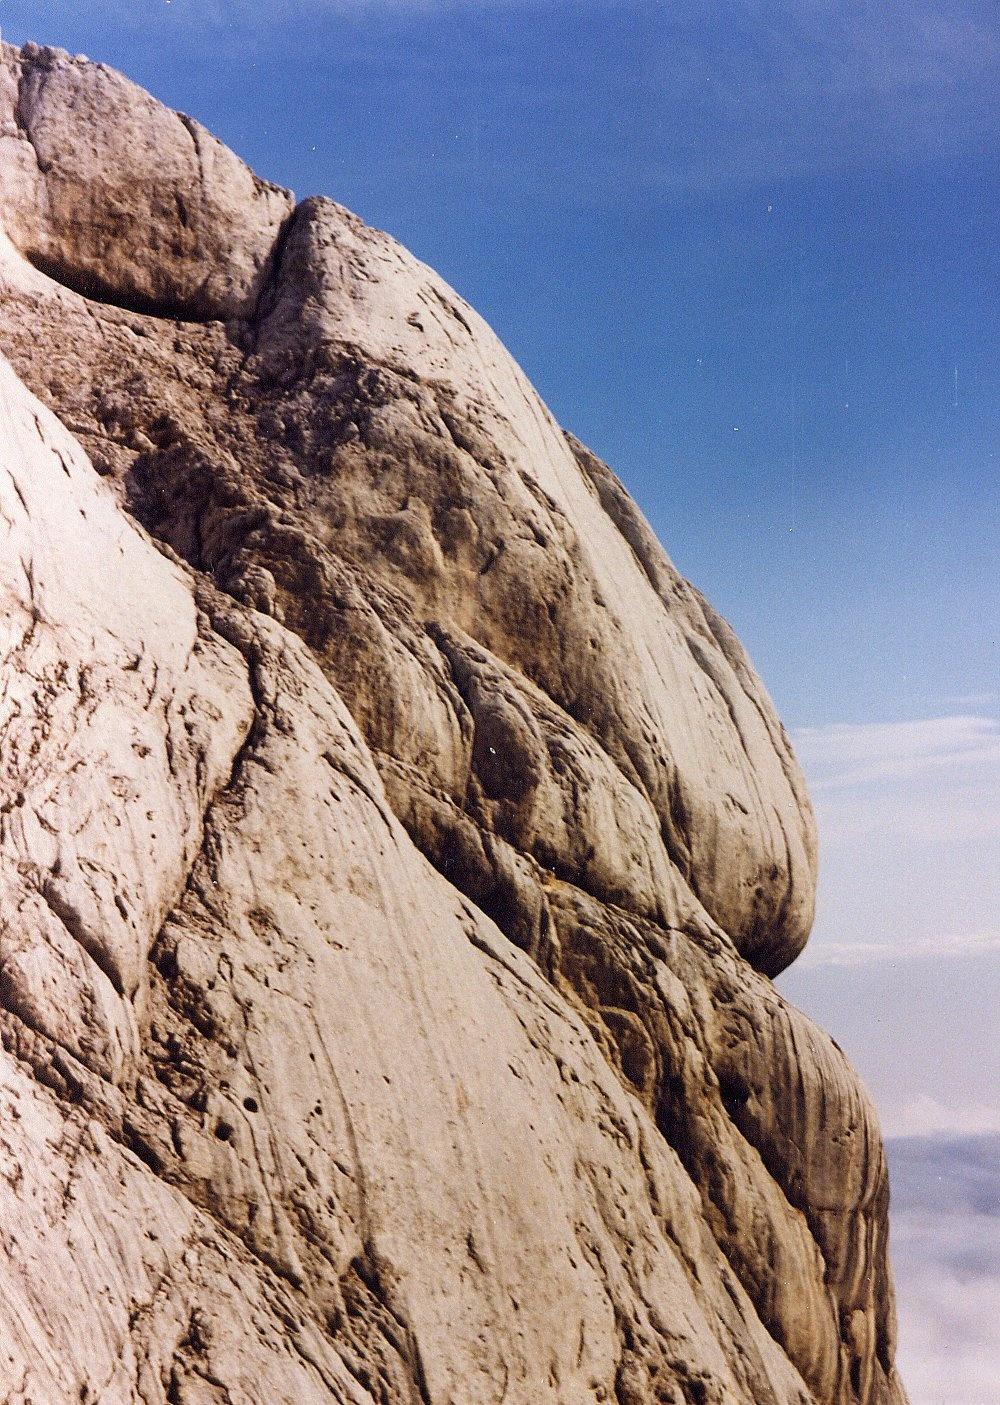 STRUCA 2457m, Kamniške alpe 1990.10.05 by zvnktomasevic